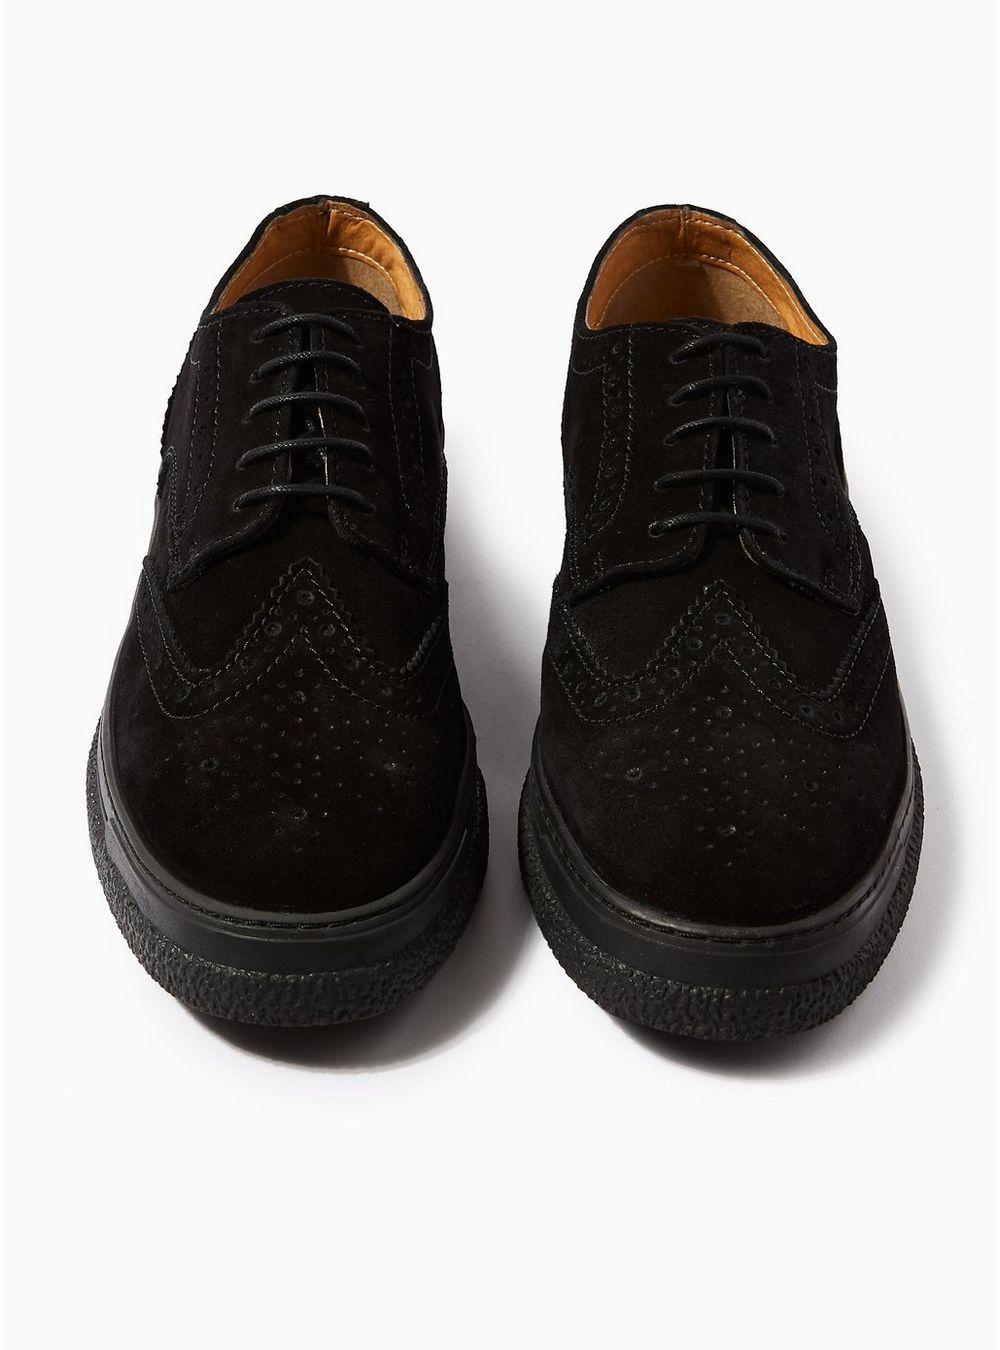 Black Suede Vesper Brogues Men S Smart Shoes Brogues Shoes Accessories Topman